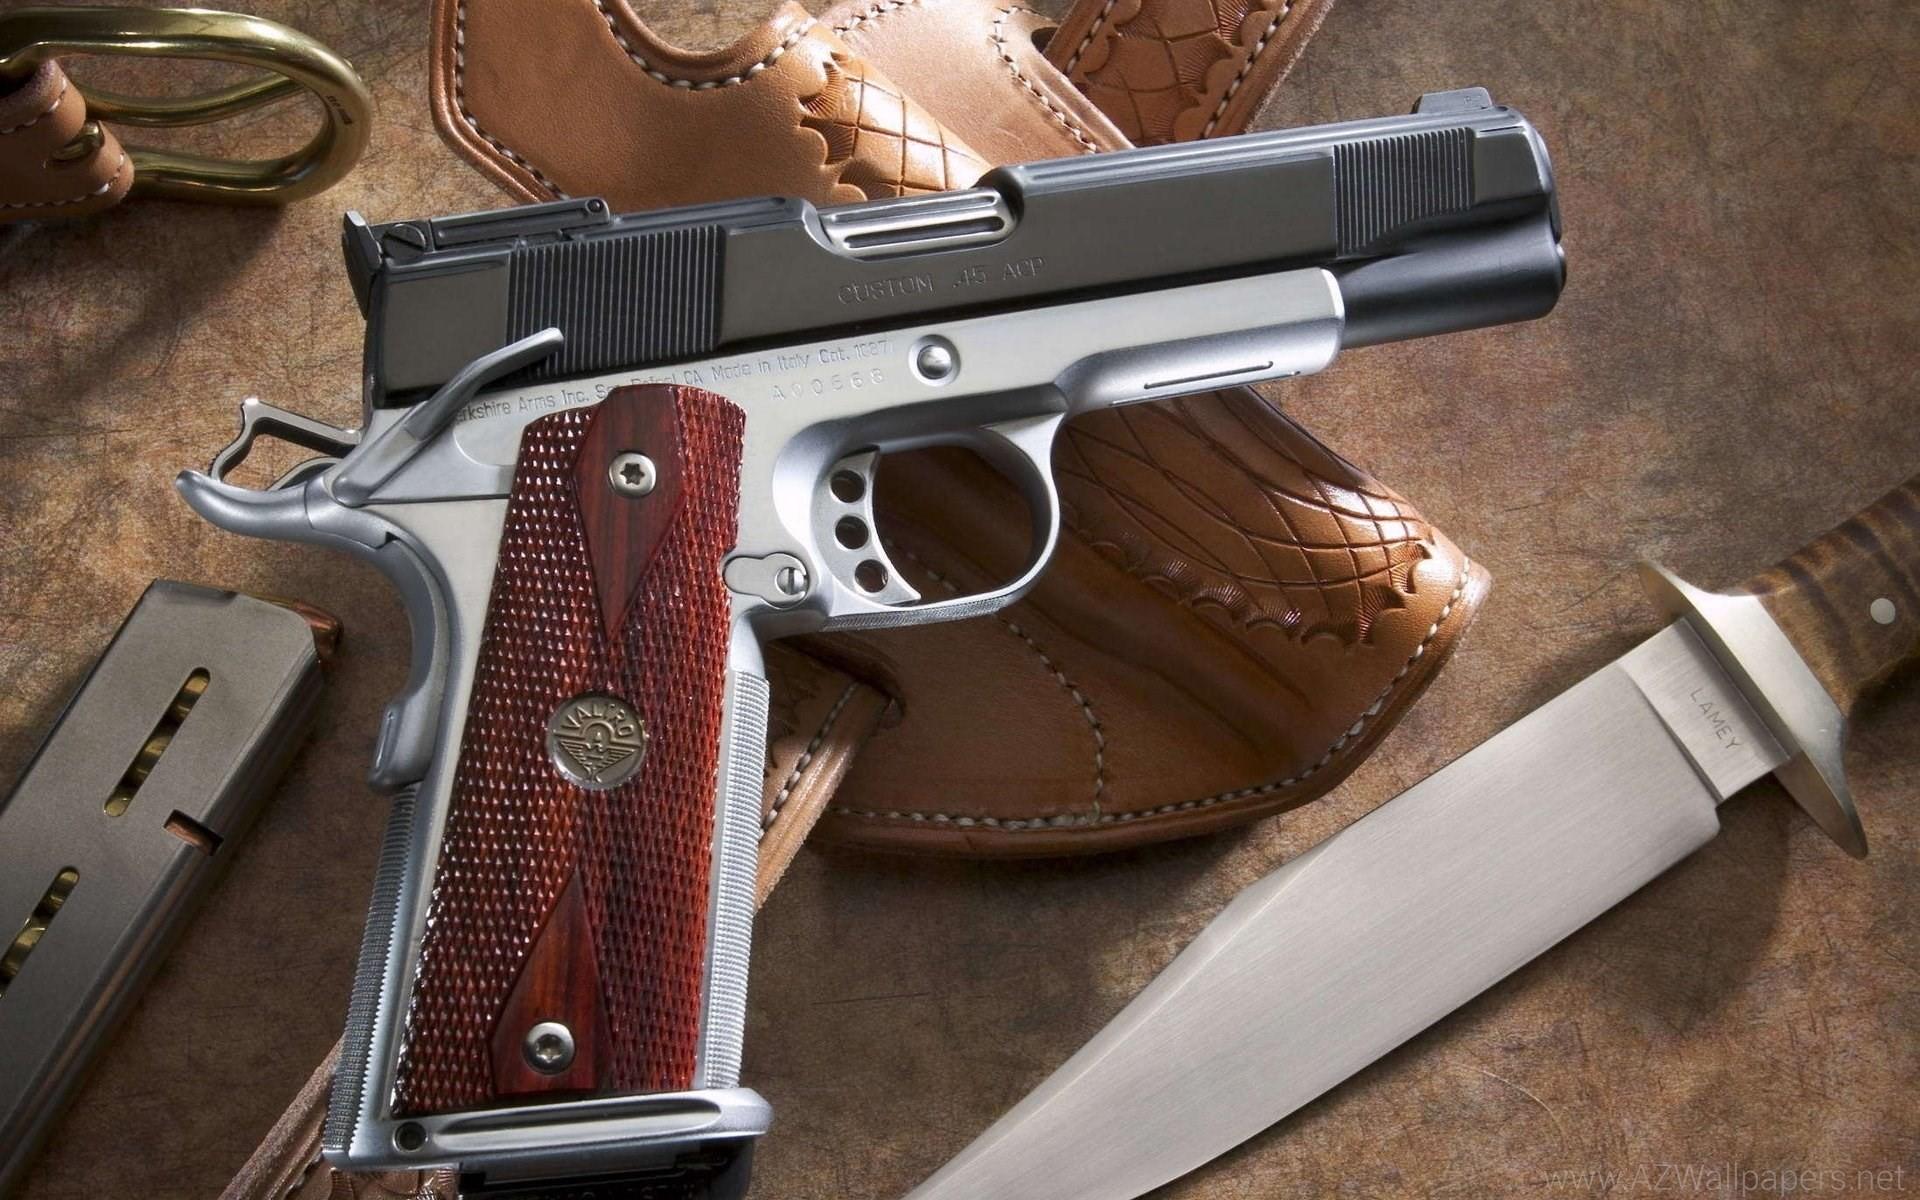 Glock Weapons Handguns Pistol Knife Wallpapers